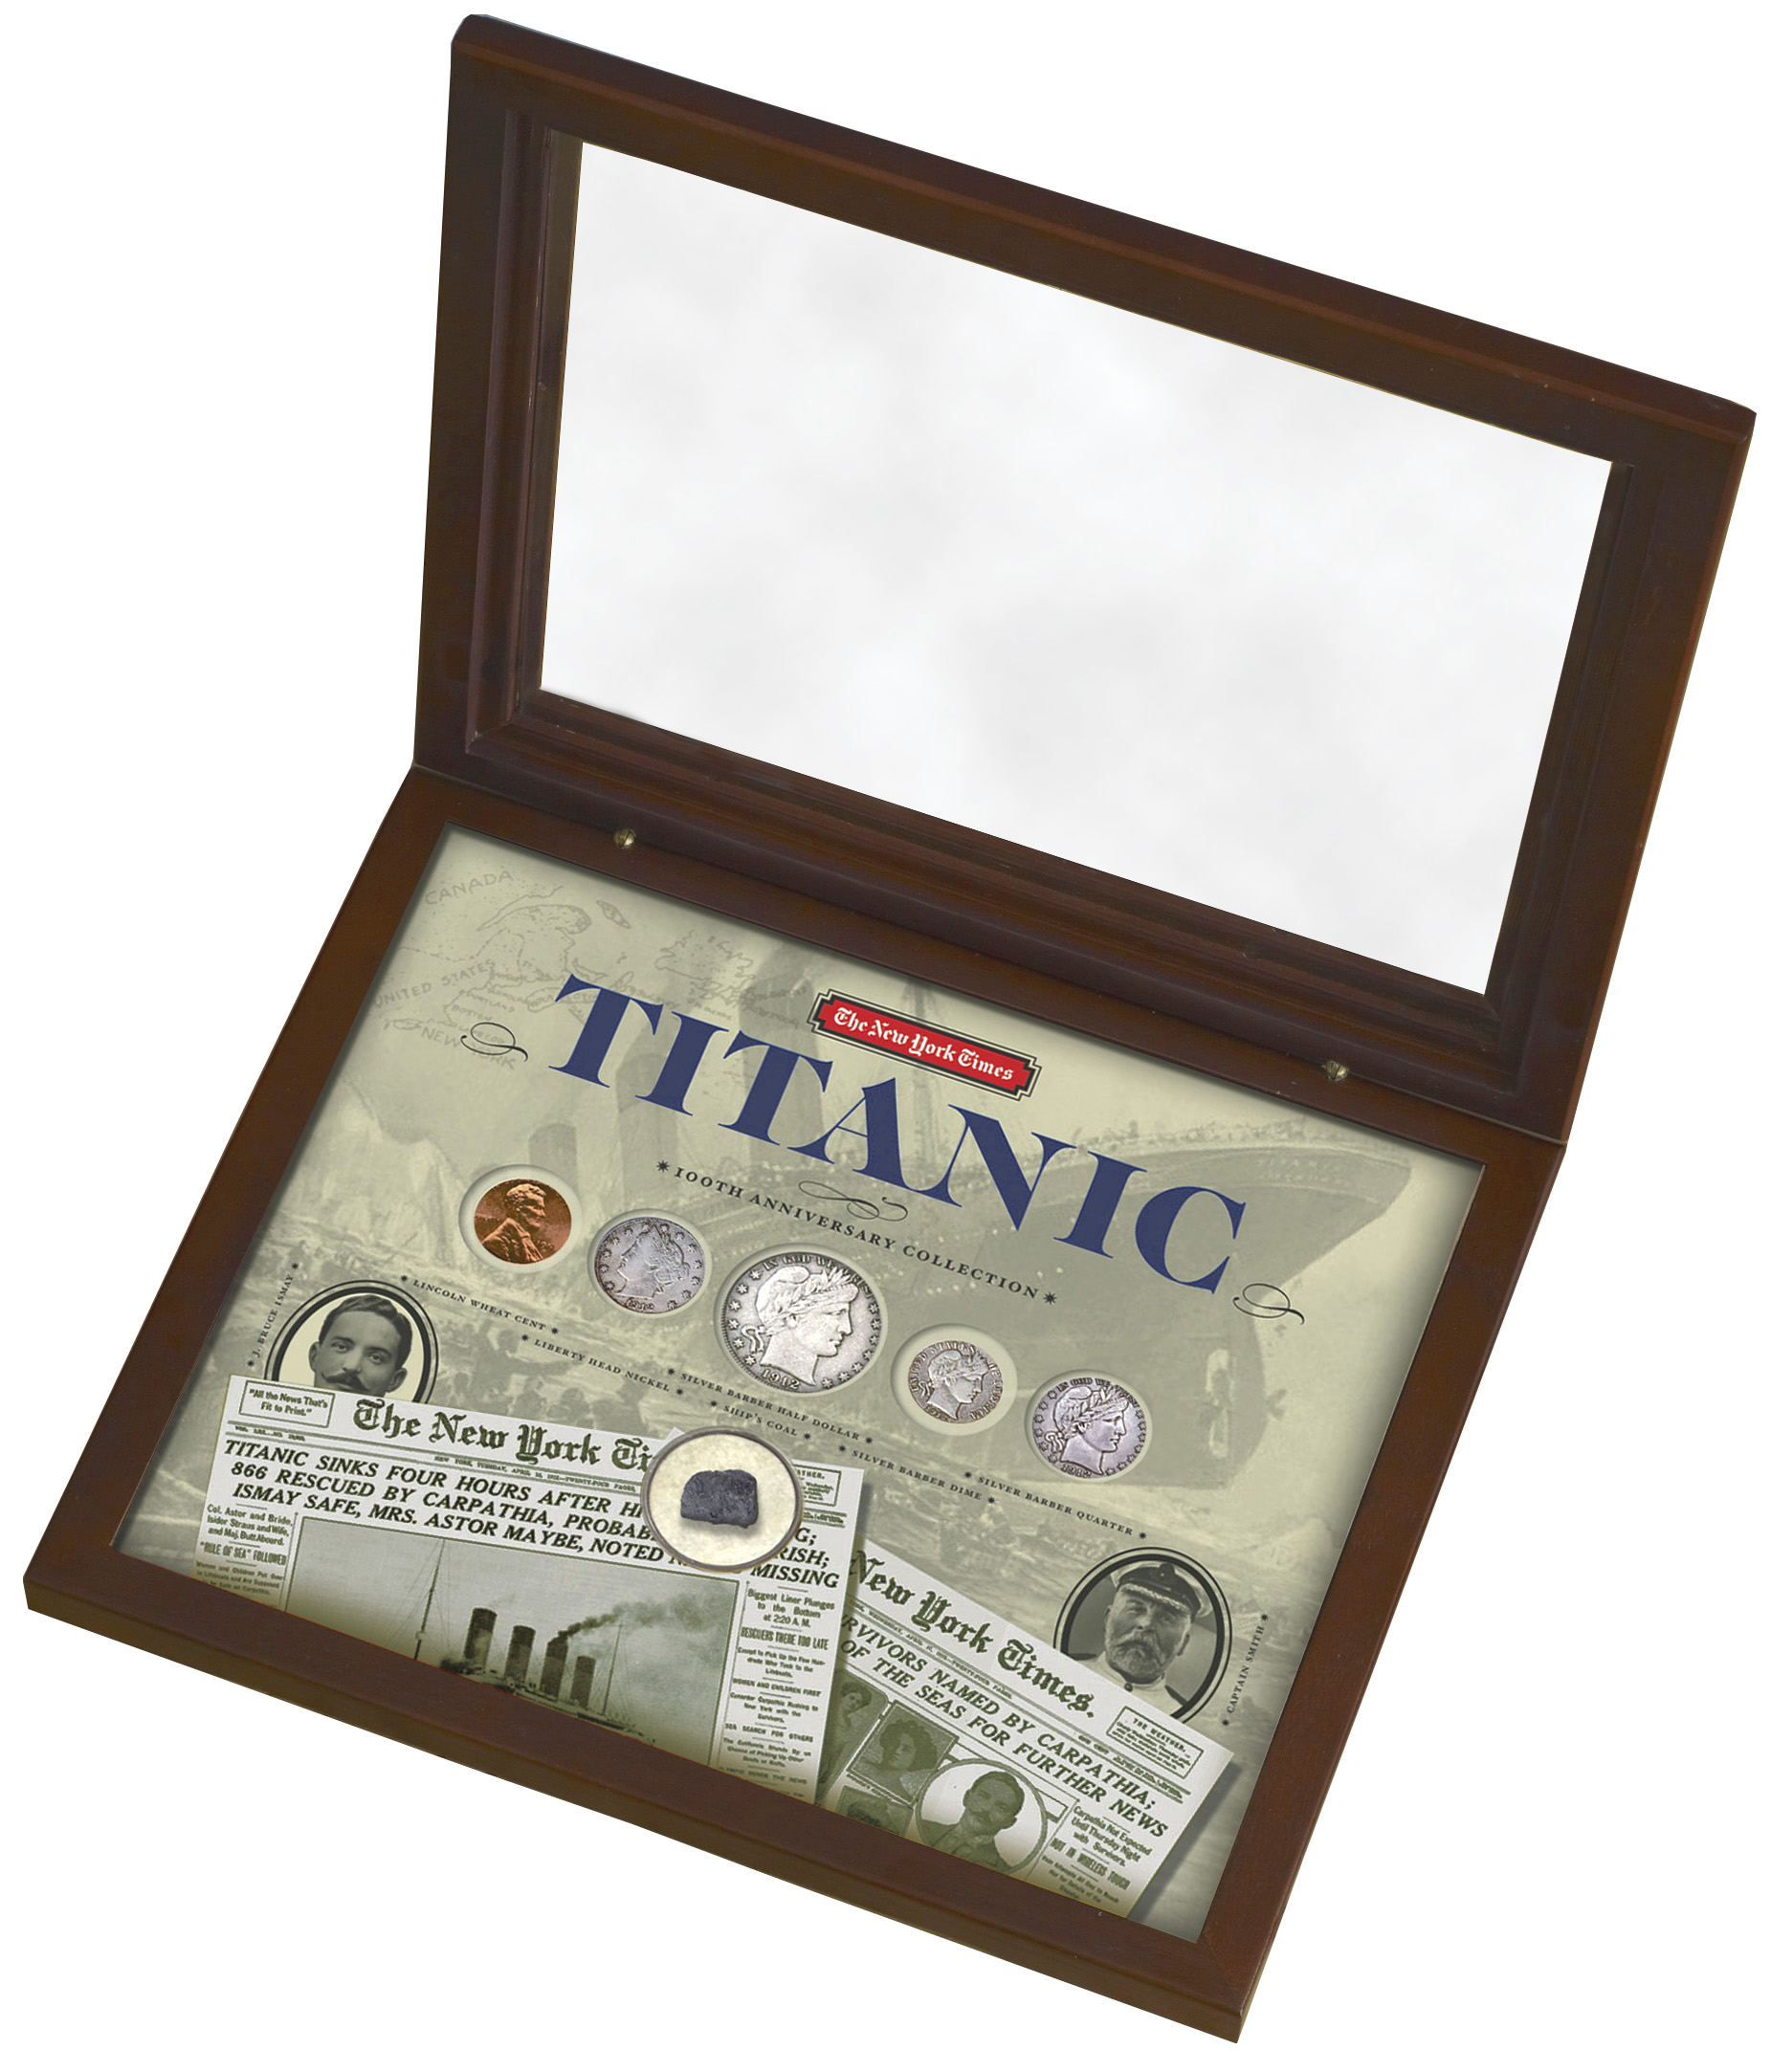 titanicboxsopensilo.jpg